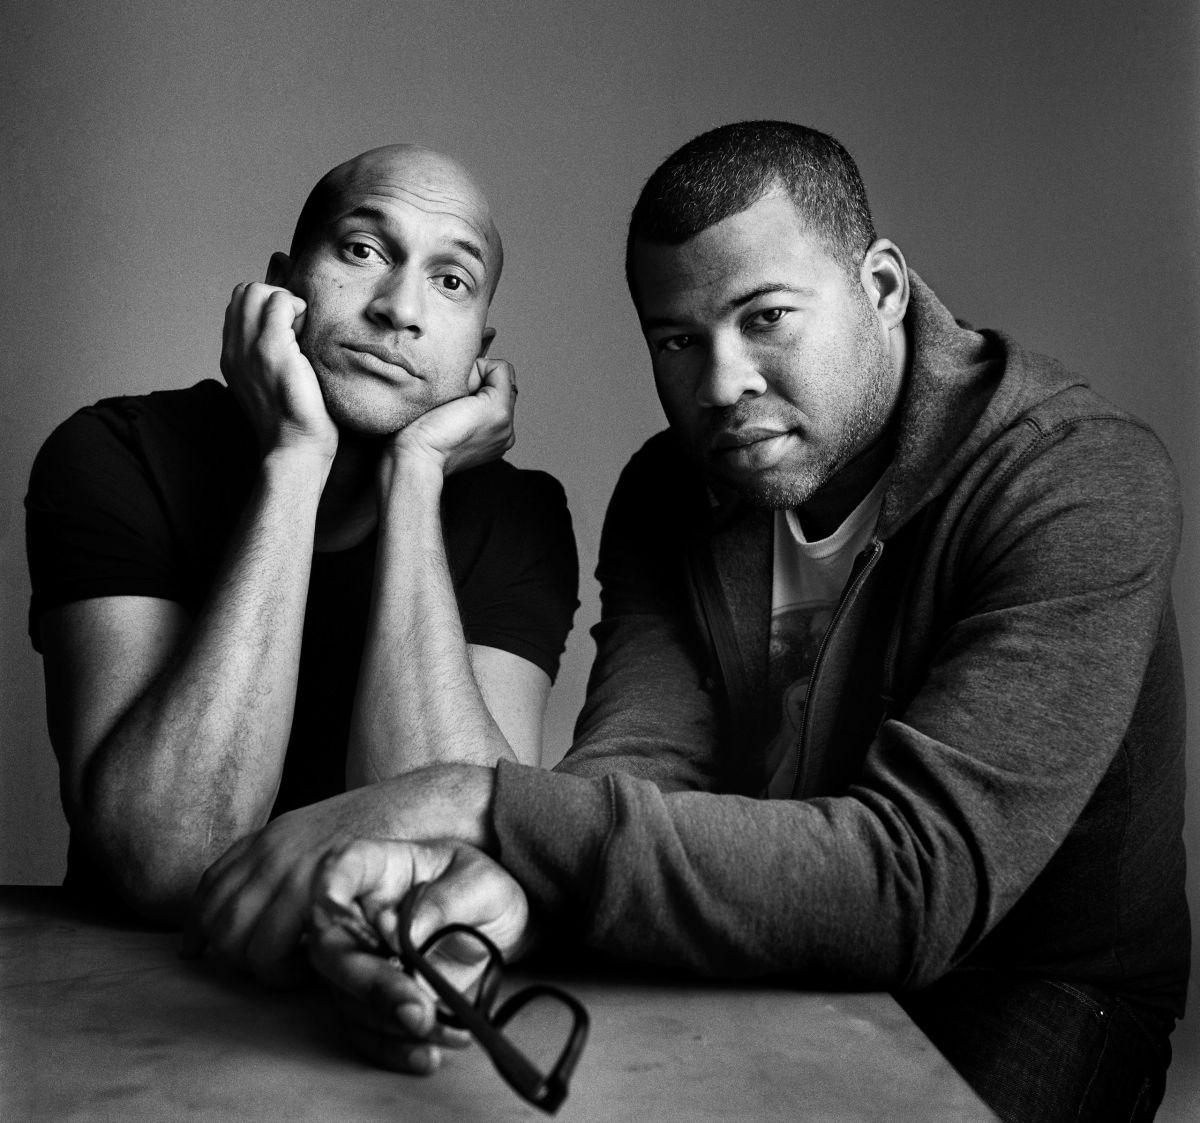 Keegan-Michael Key (left) and Jordan Peele (right). Photo: Graeme Mitchell